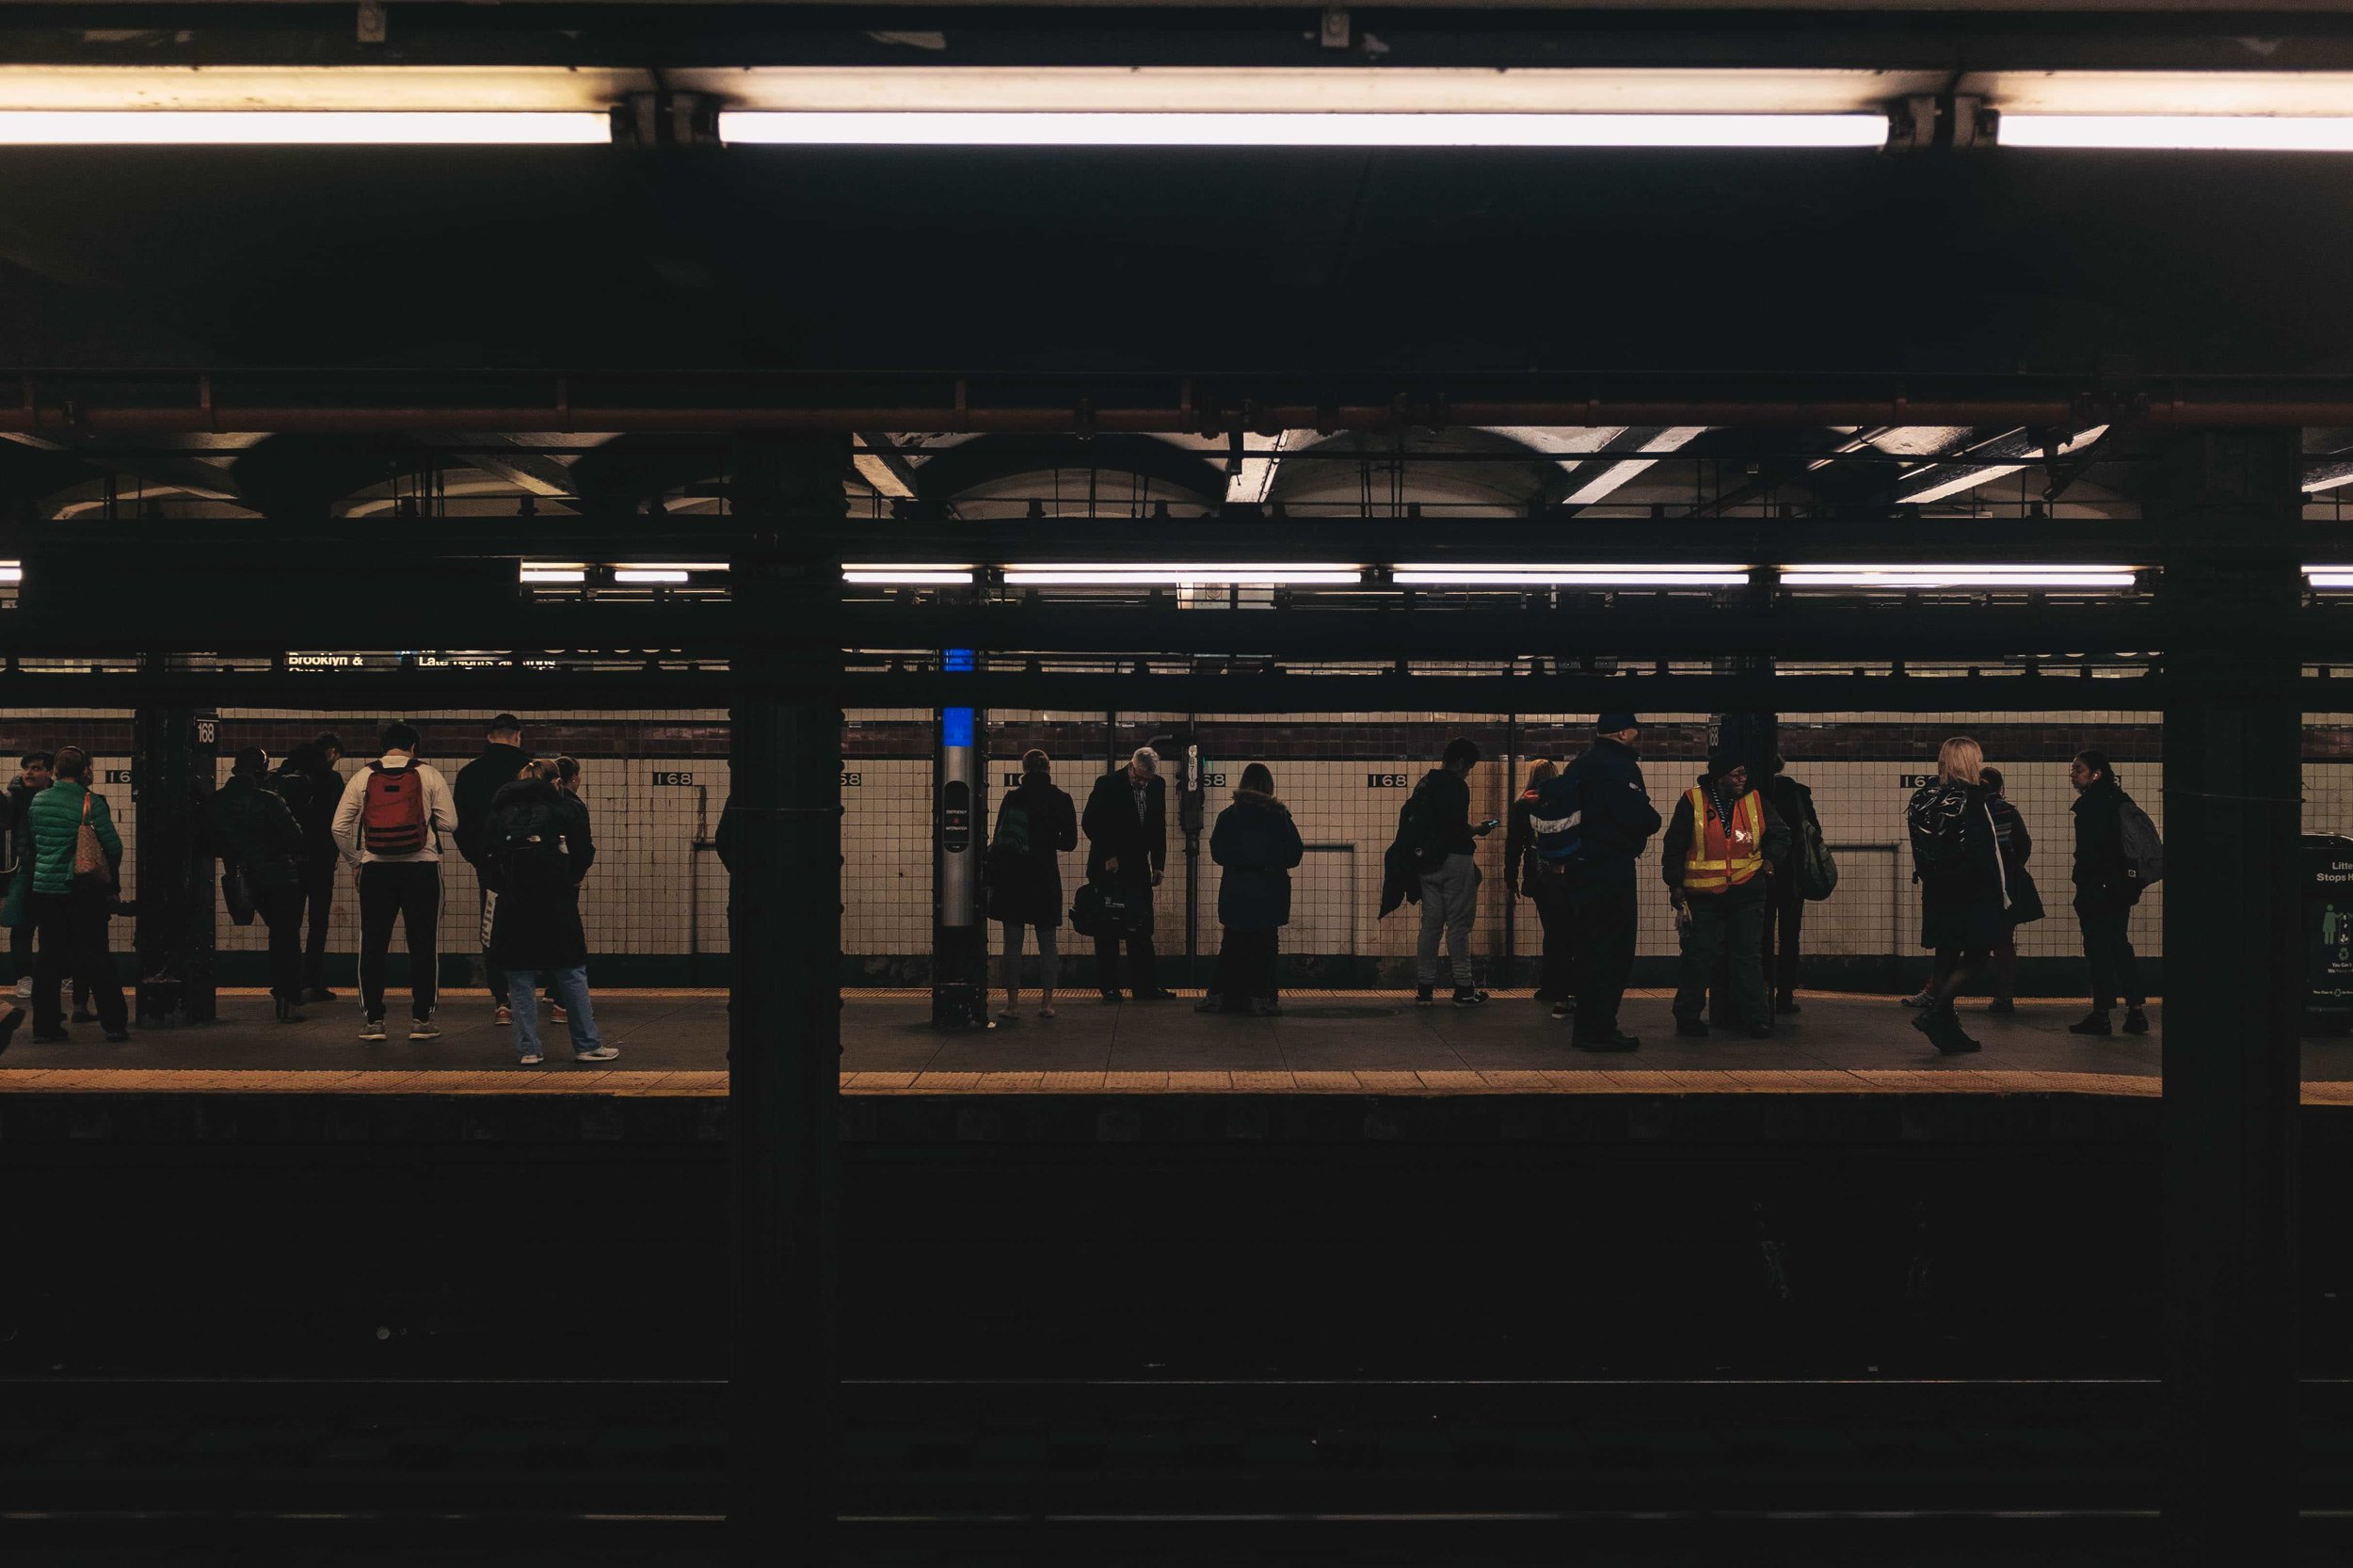 nyc-subway-platform.jpg